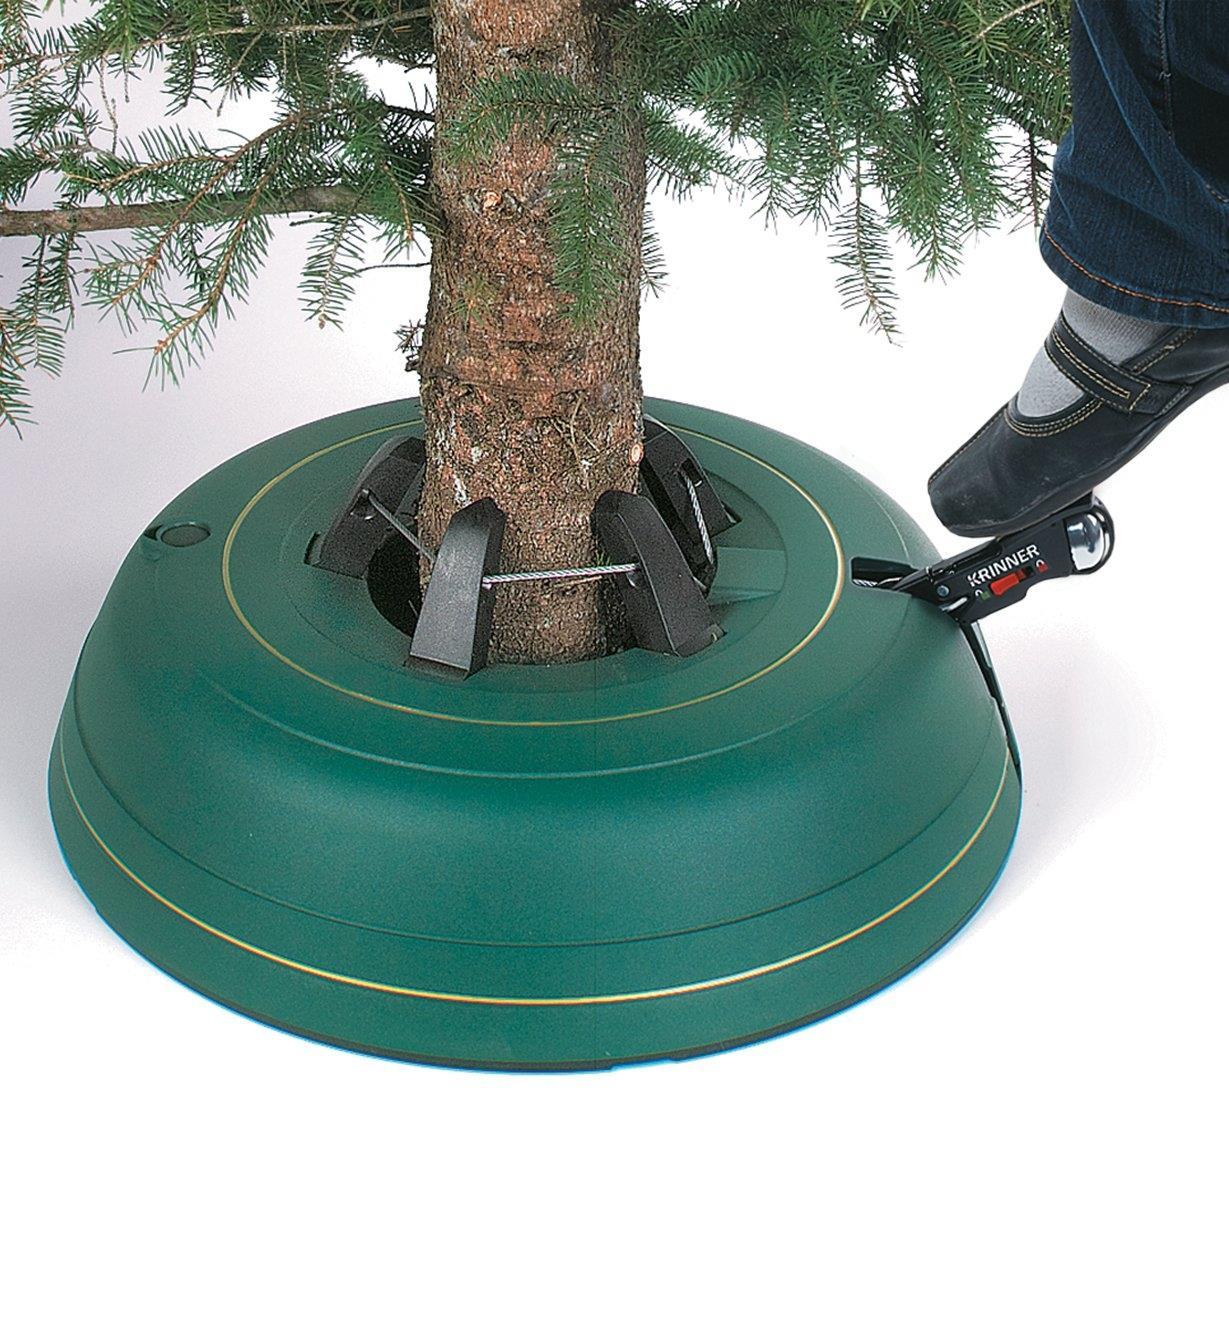 45K1525 - Krinner Christmas Tree Stand